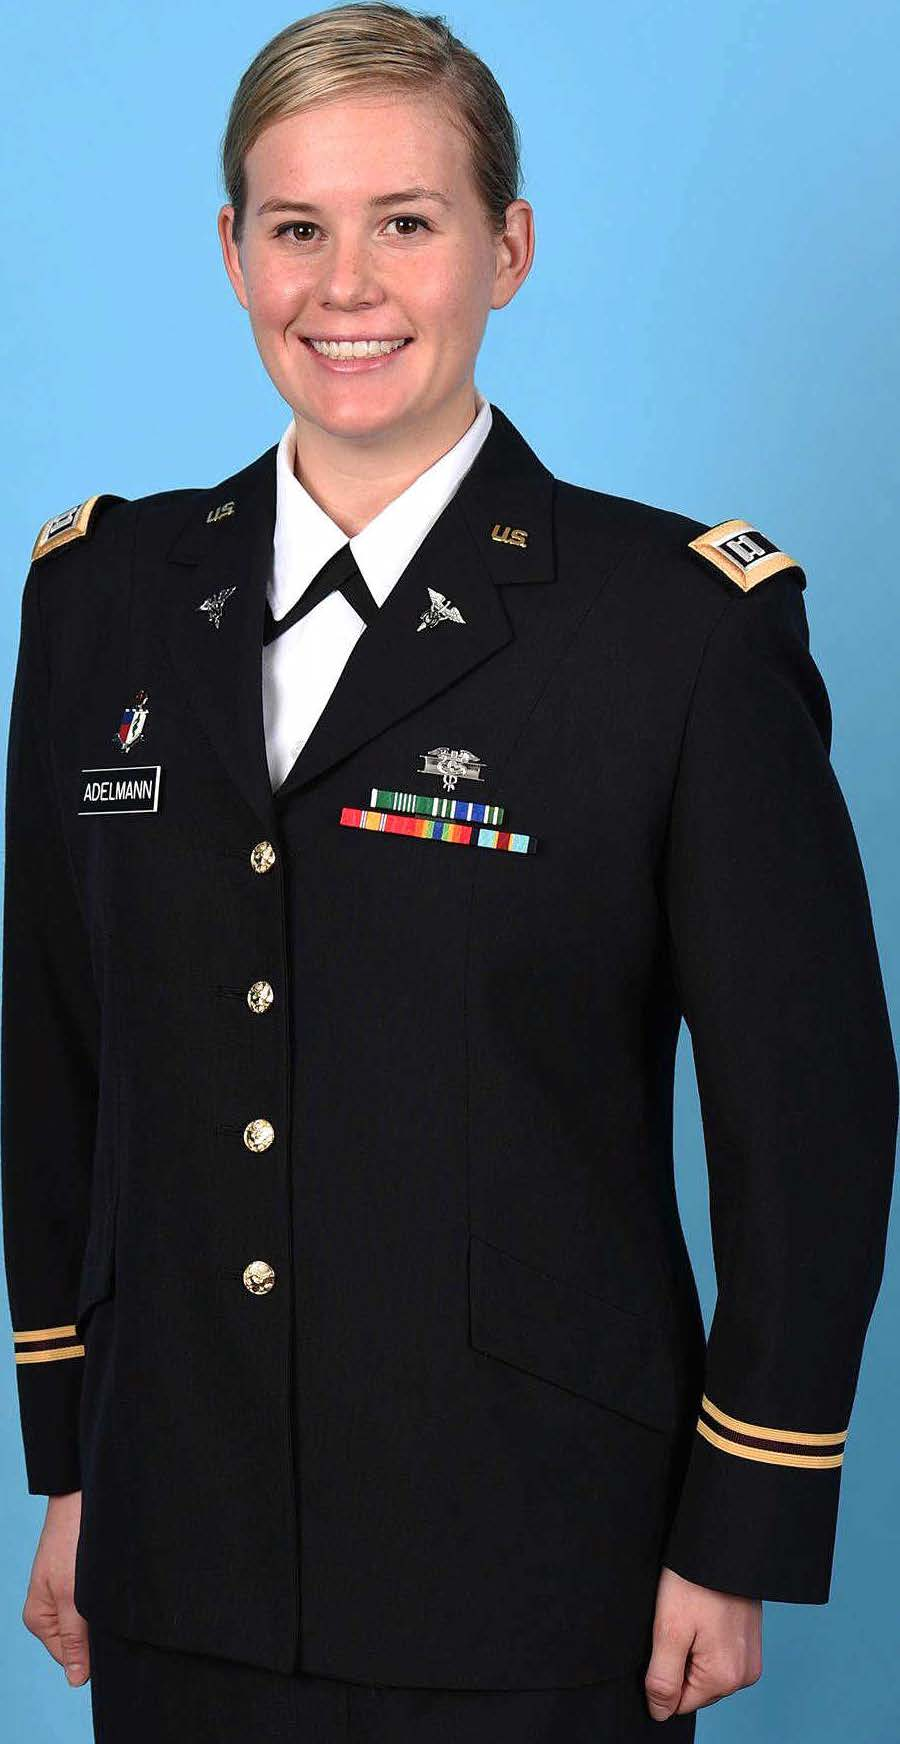 2020 US Army Women's Foundation 2020 Scholarship Recipient Emily Adelmann